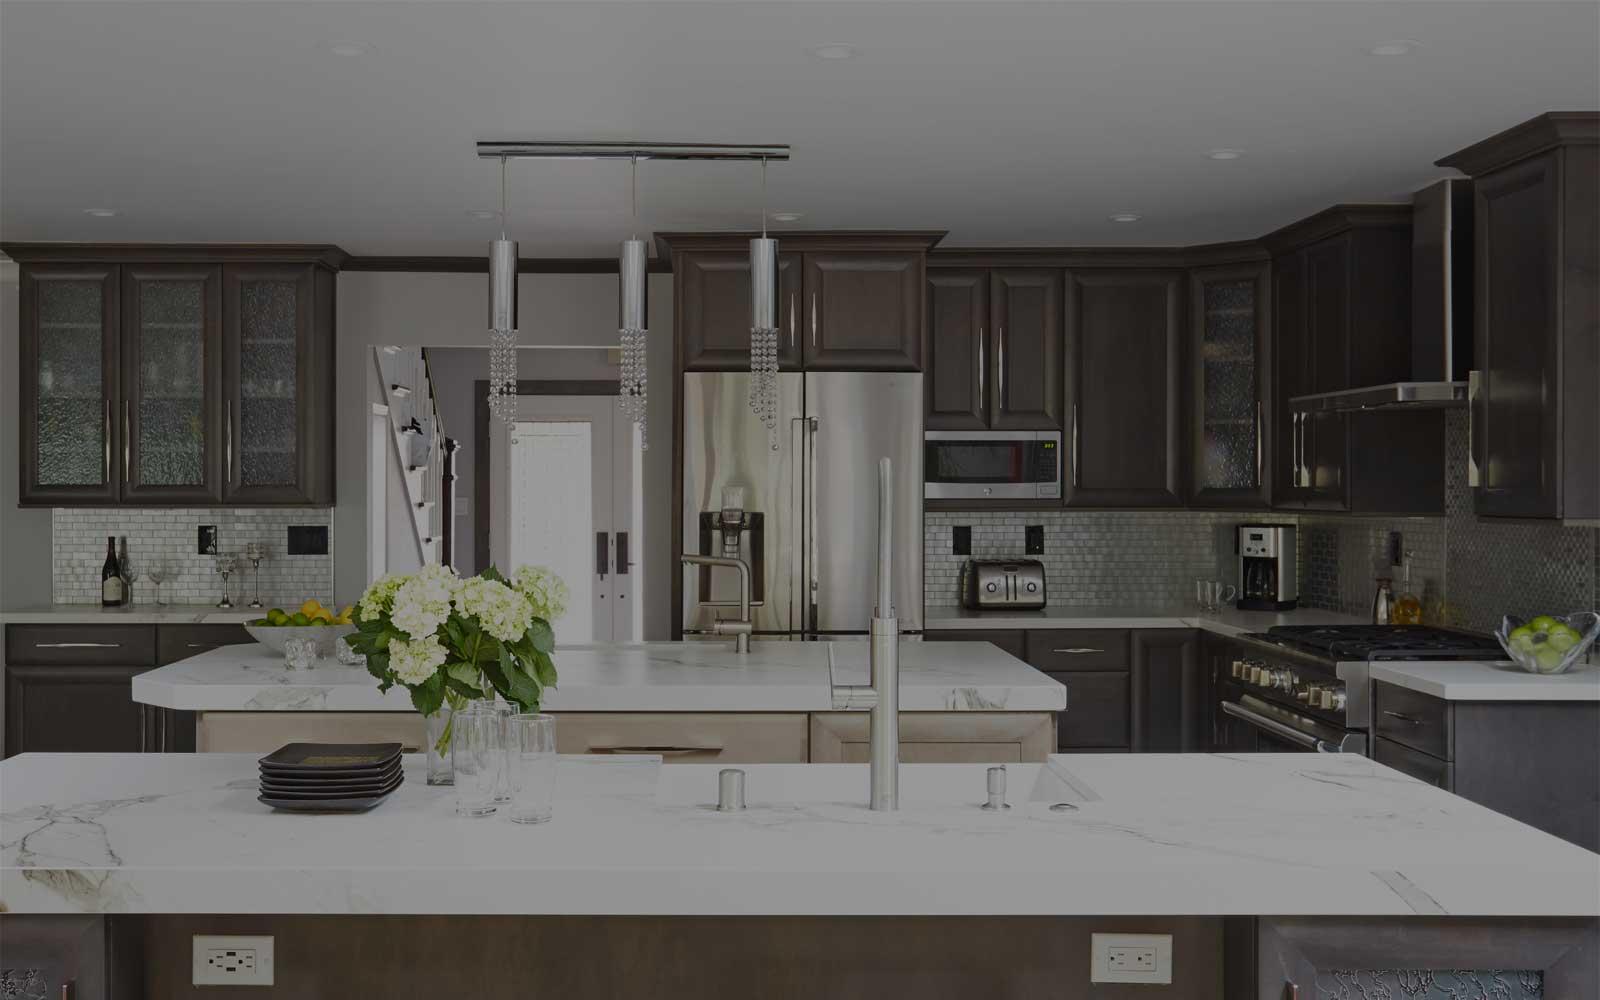 Contact Us | Signature Kitchen & Bath Design